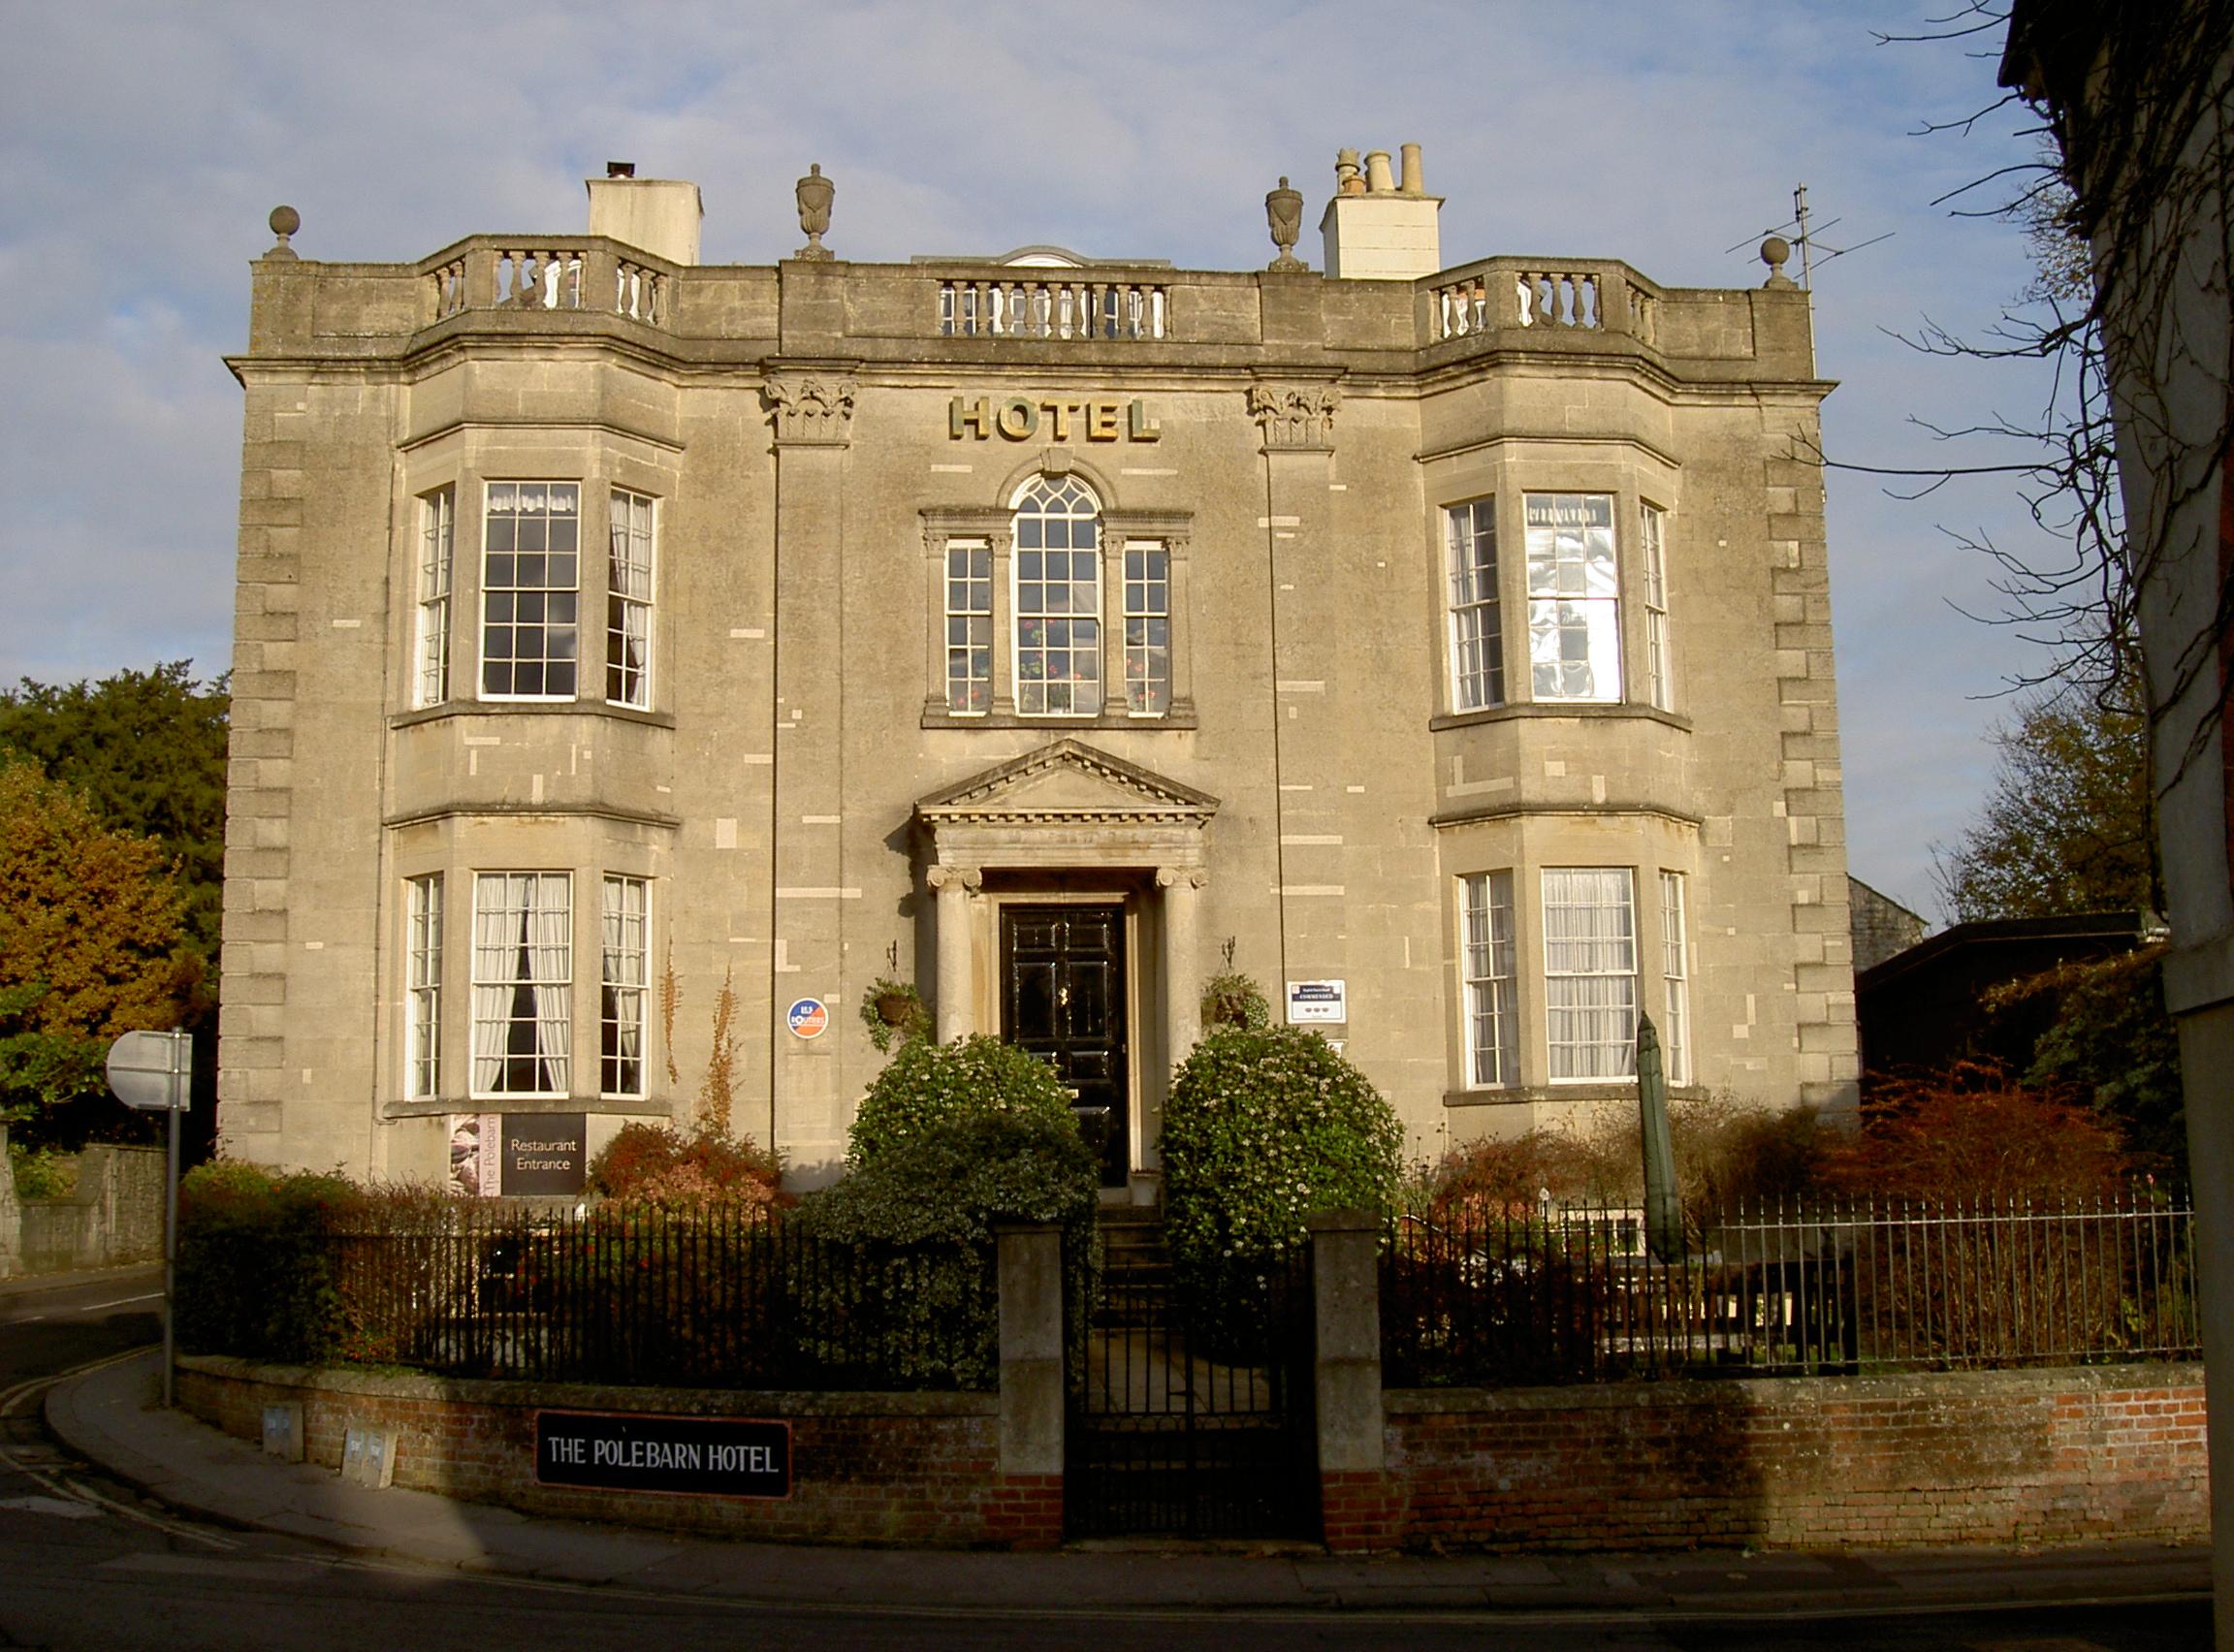 File:The Polebarn Hotel, Trowbidge.jpg - Wikipedia